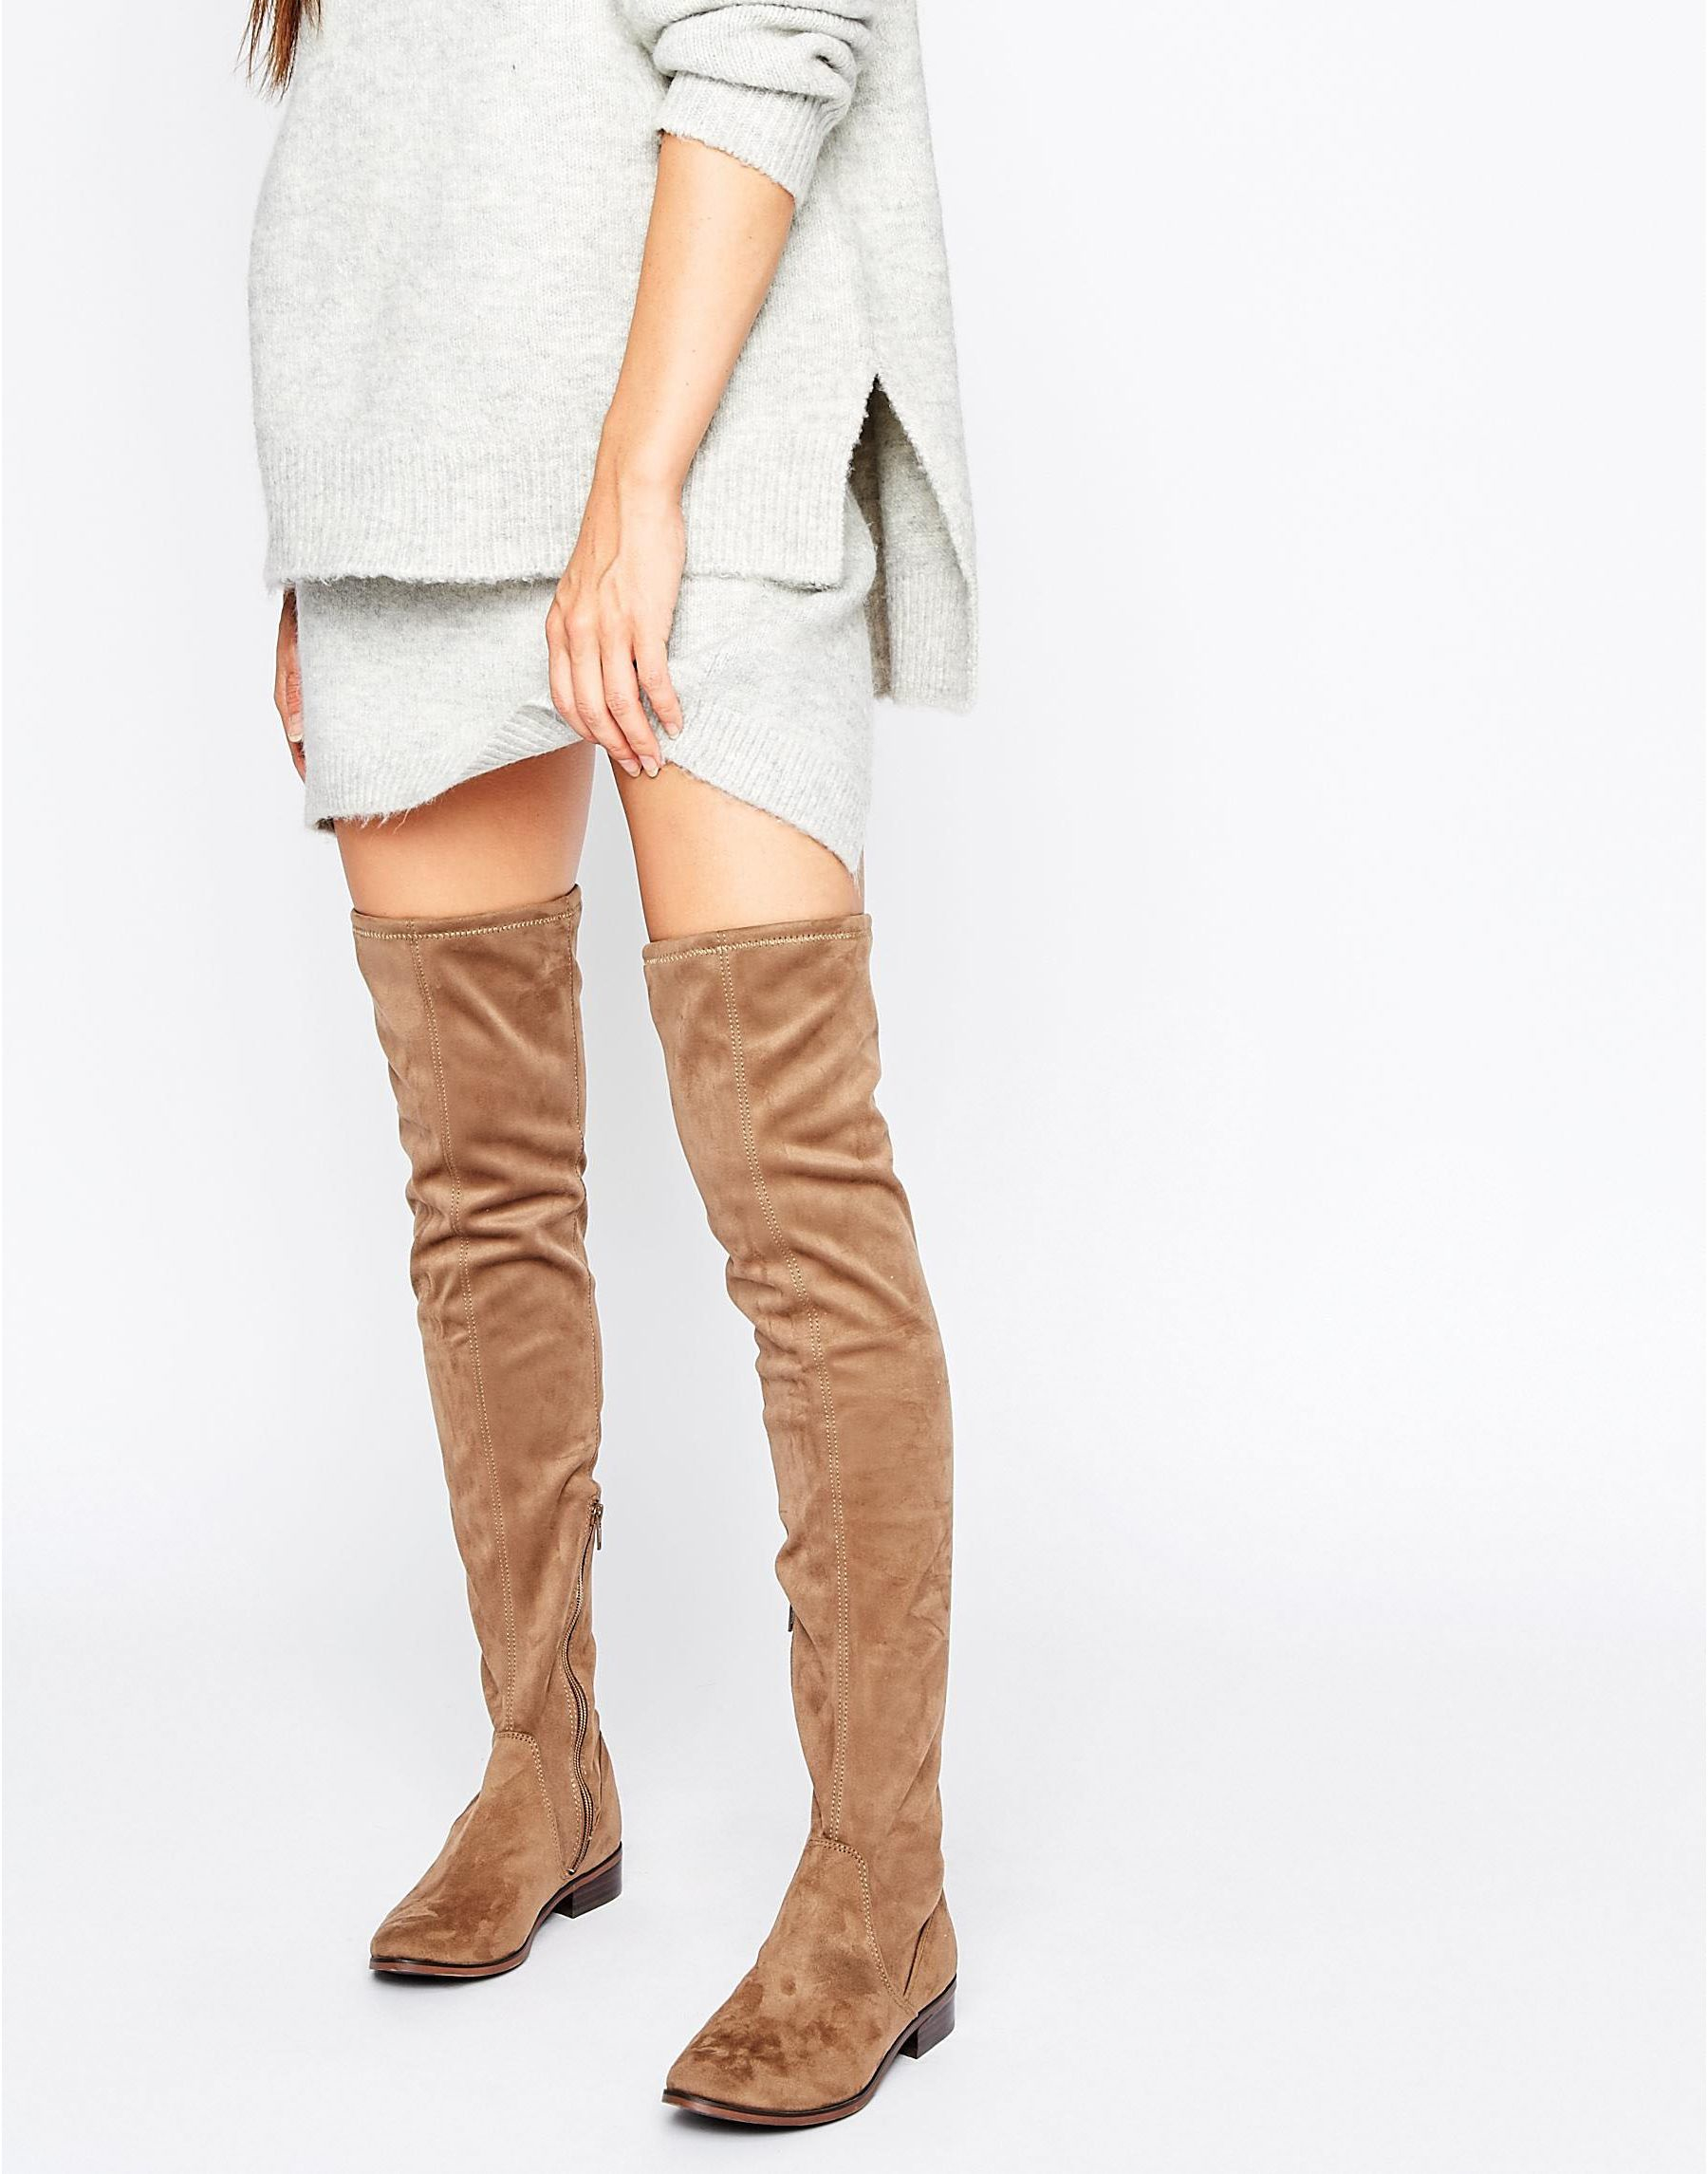 2bab827ea30 Lyst - ALDO Ldo Elinna Flat Over The Knee Boots in Brown